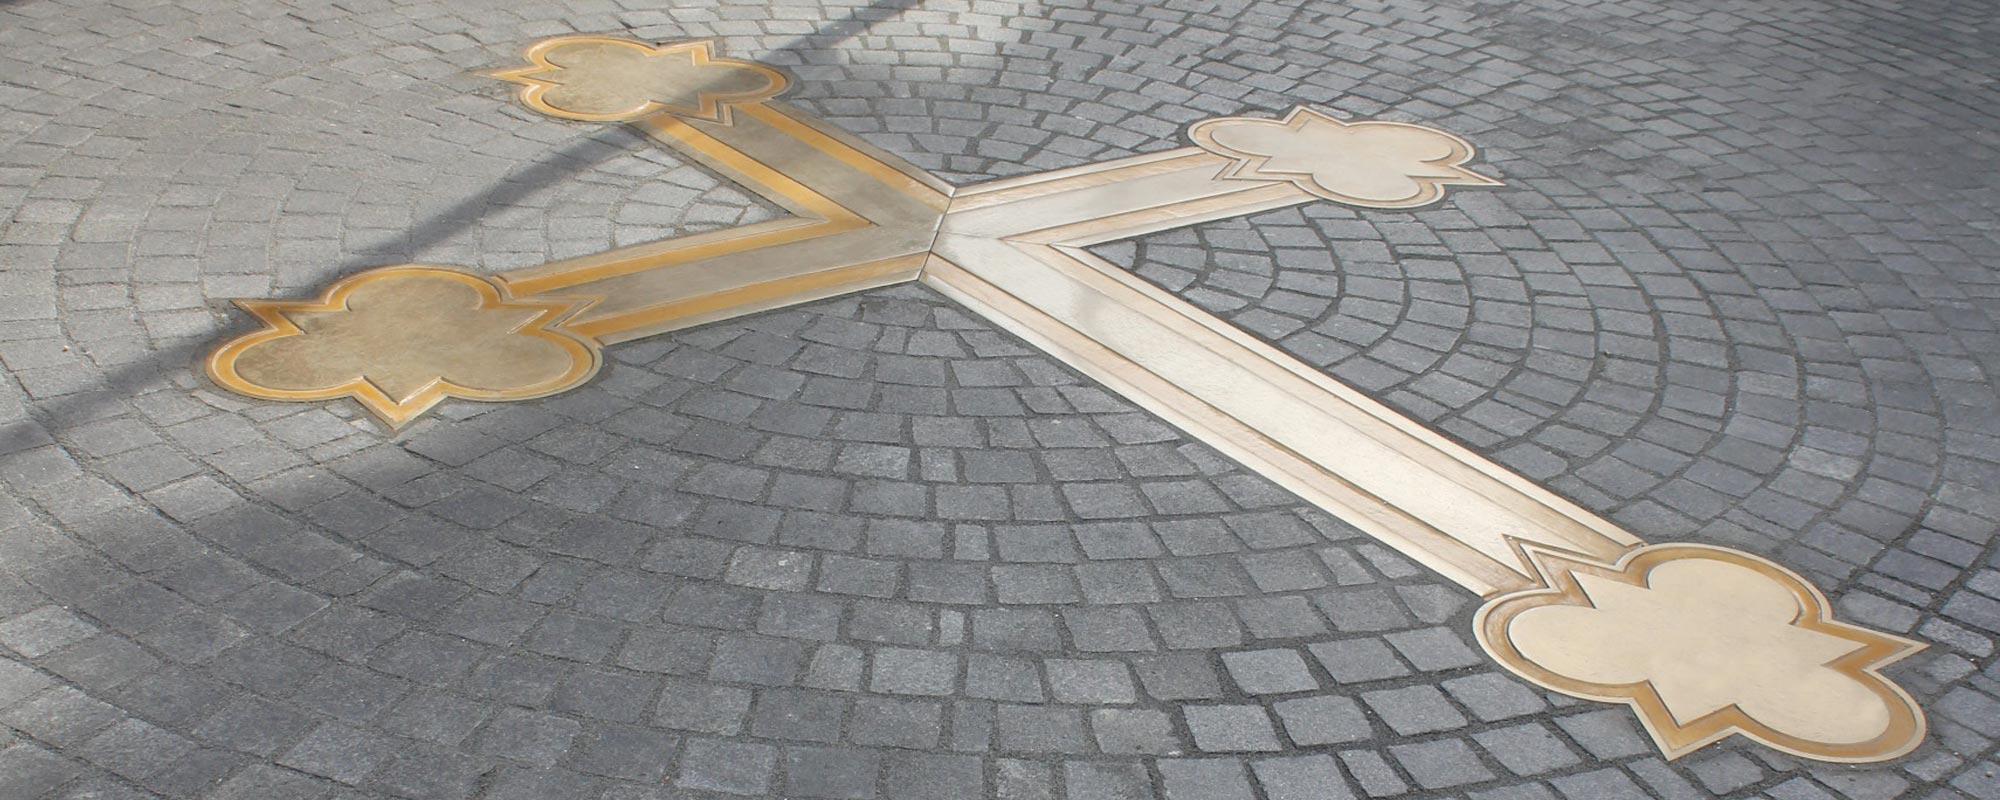 Straßenplanung_Bachstraße_Slide_4